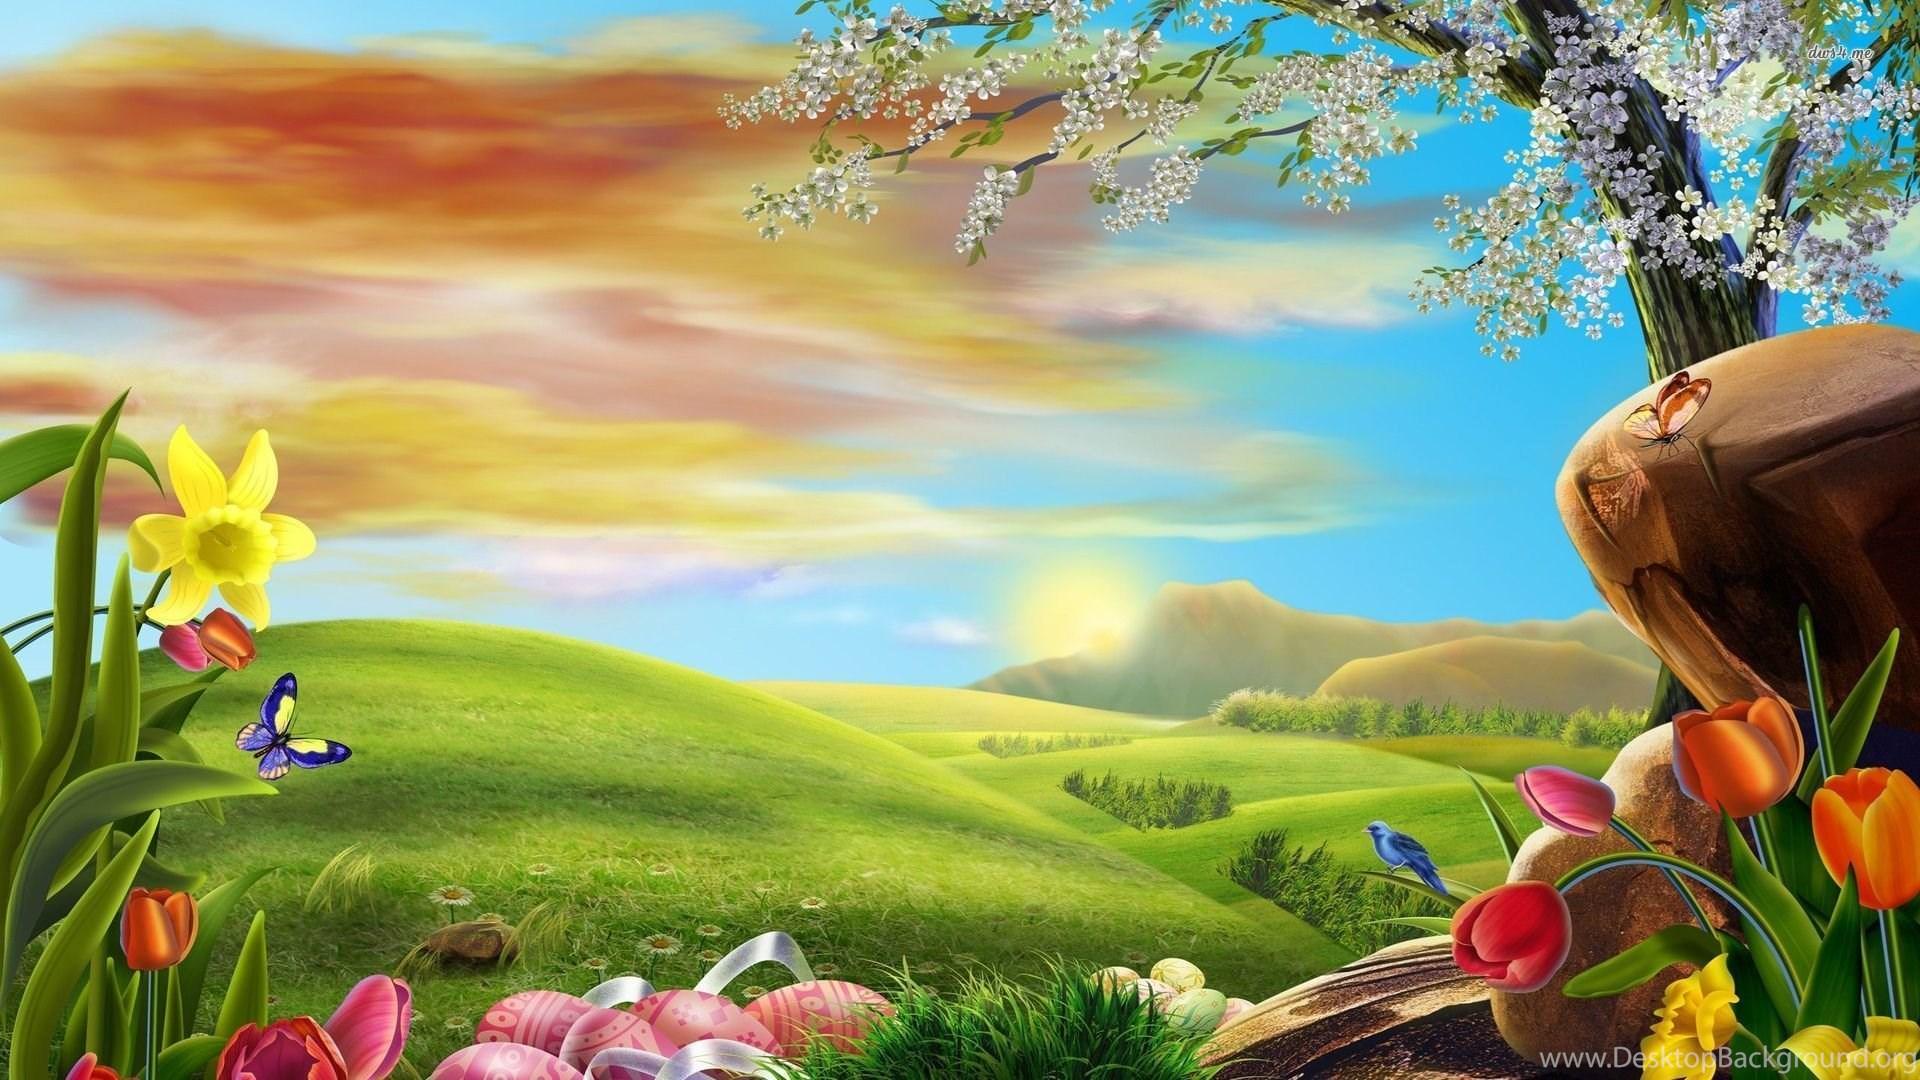 easter wallpapers hd download free desktop background